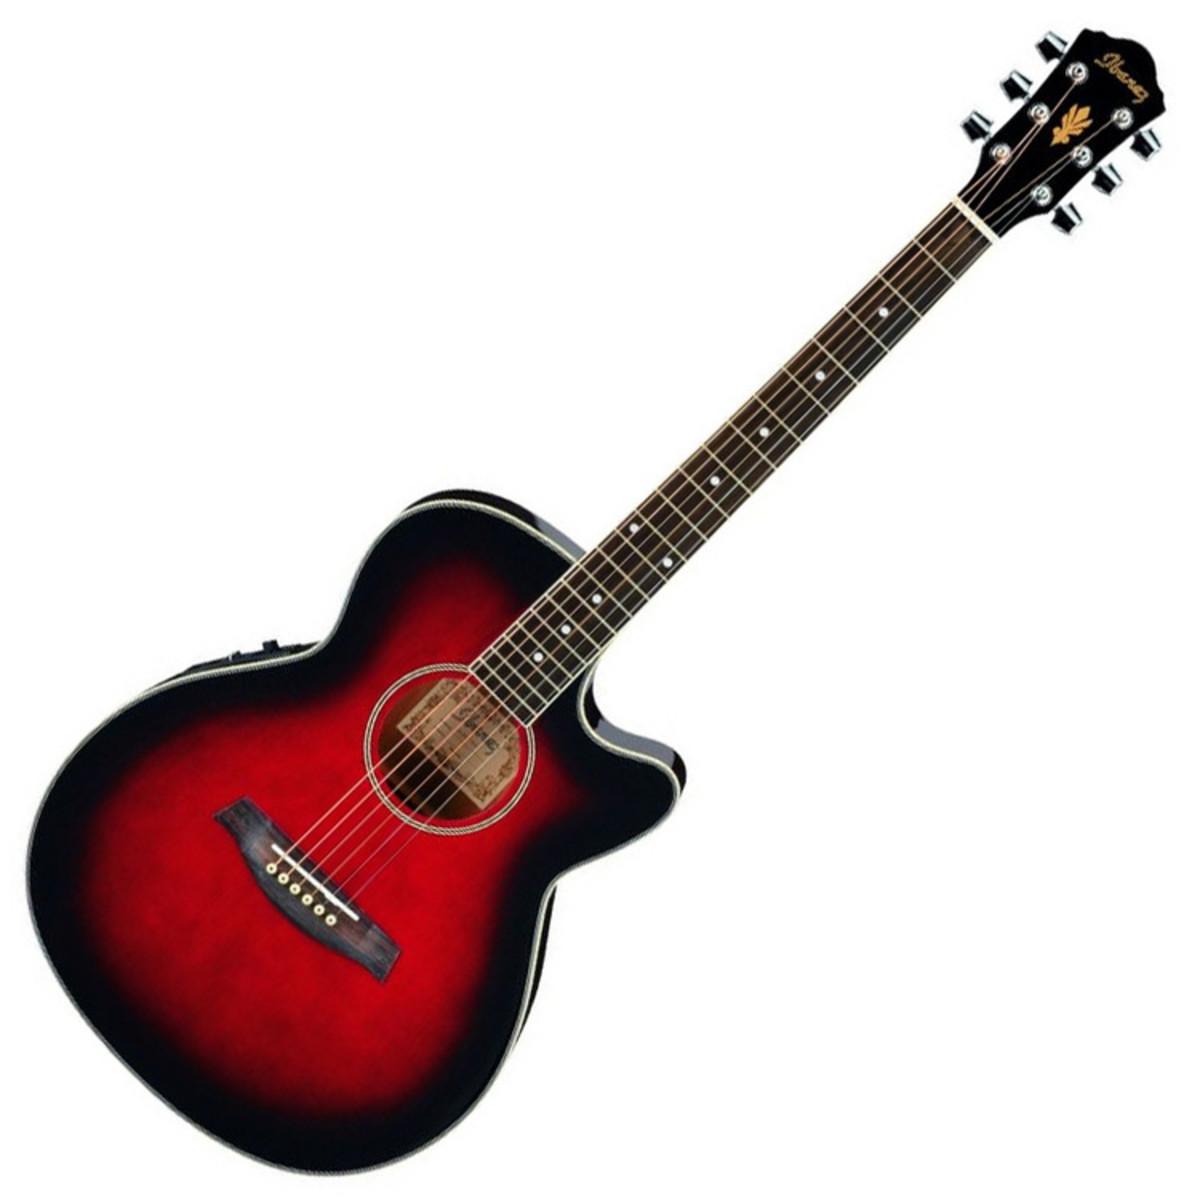 disc ibanez aeg5e electro acoustic guitar jampack in trans. Black Bedroom Furniture Sets. Home Design Ideas